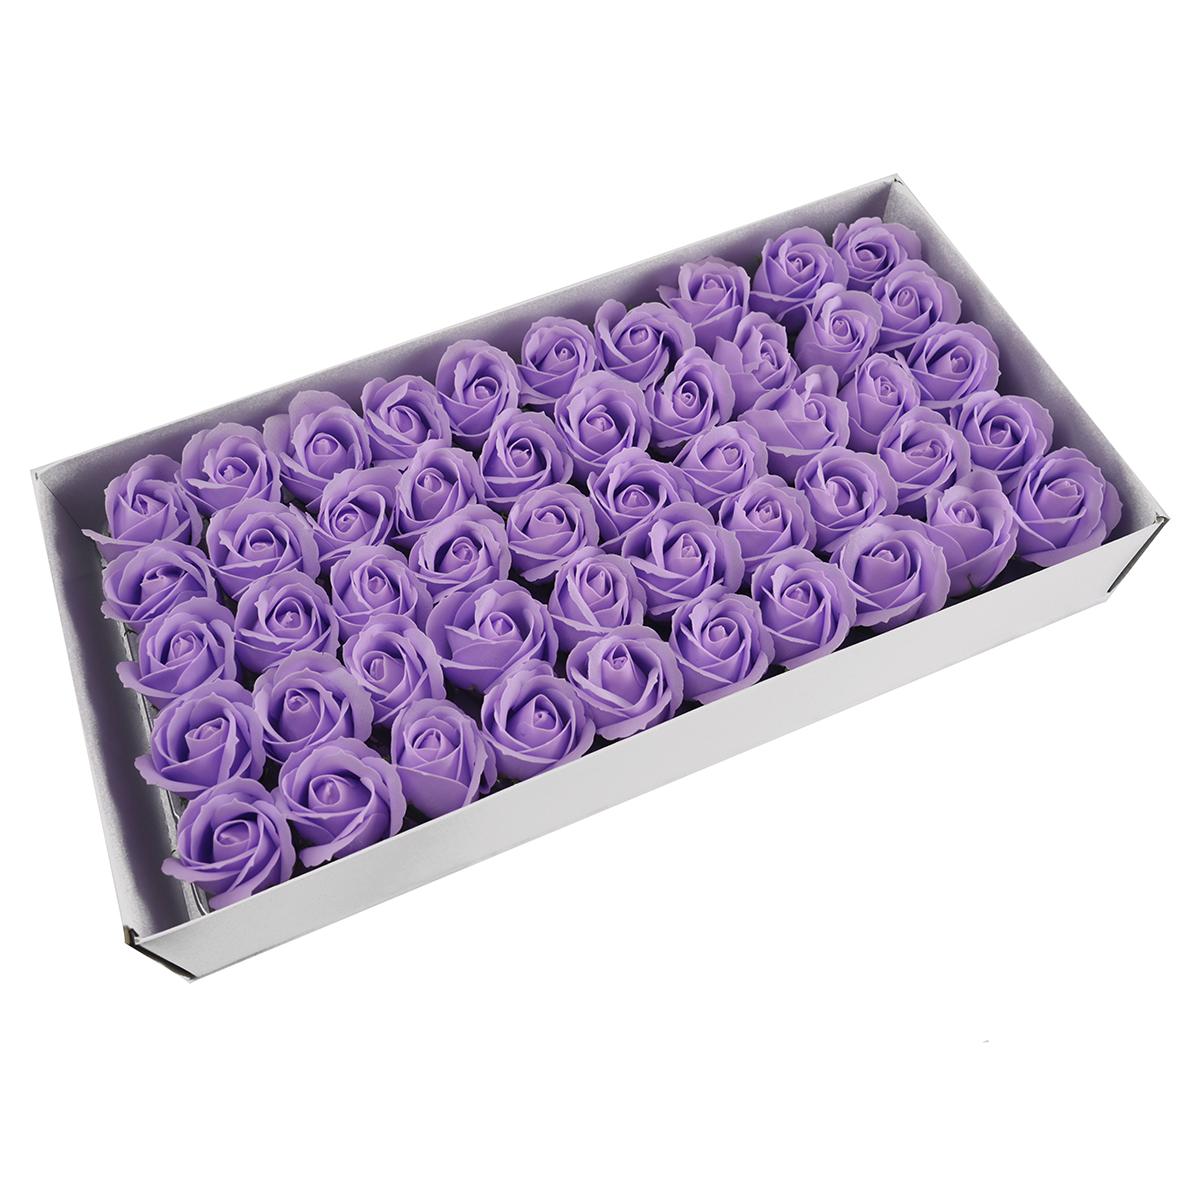 Juego de 50 rosas de jabón aromáticas, toque real, lila claro